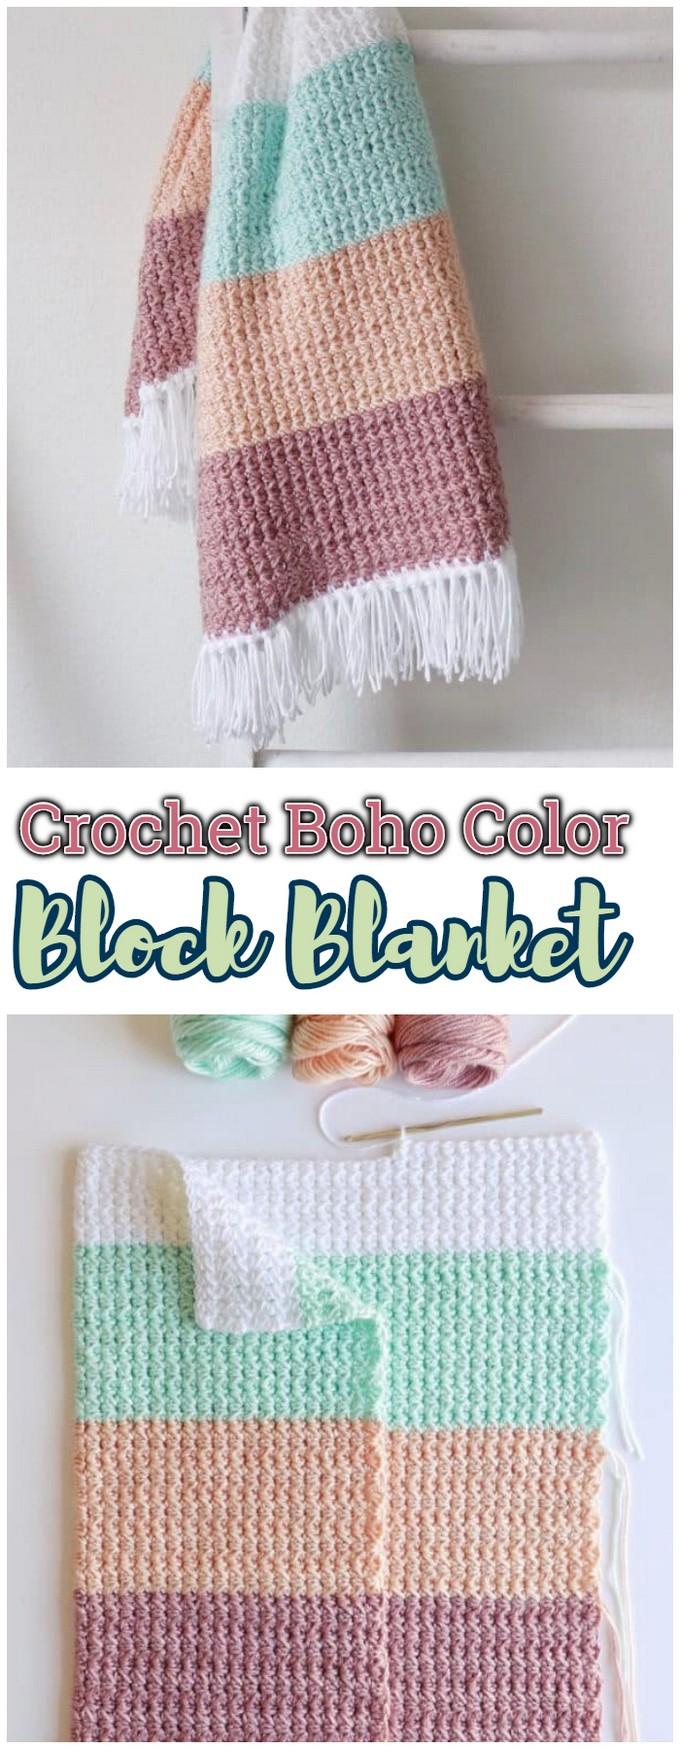 Crochet Boho Color Block Blanket